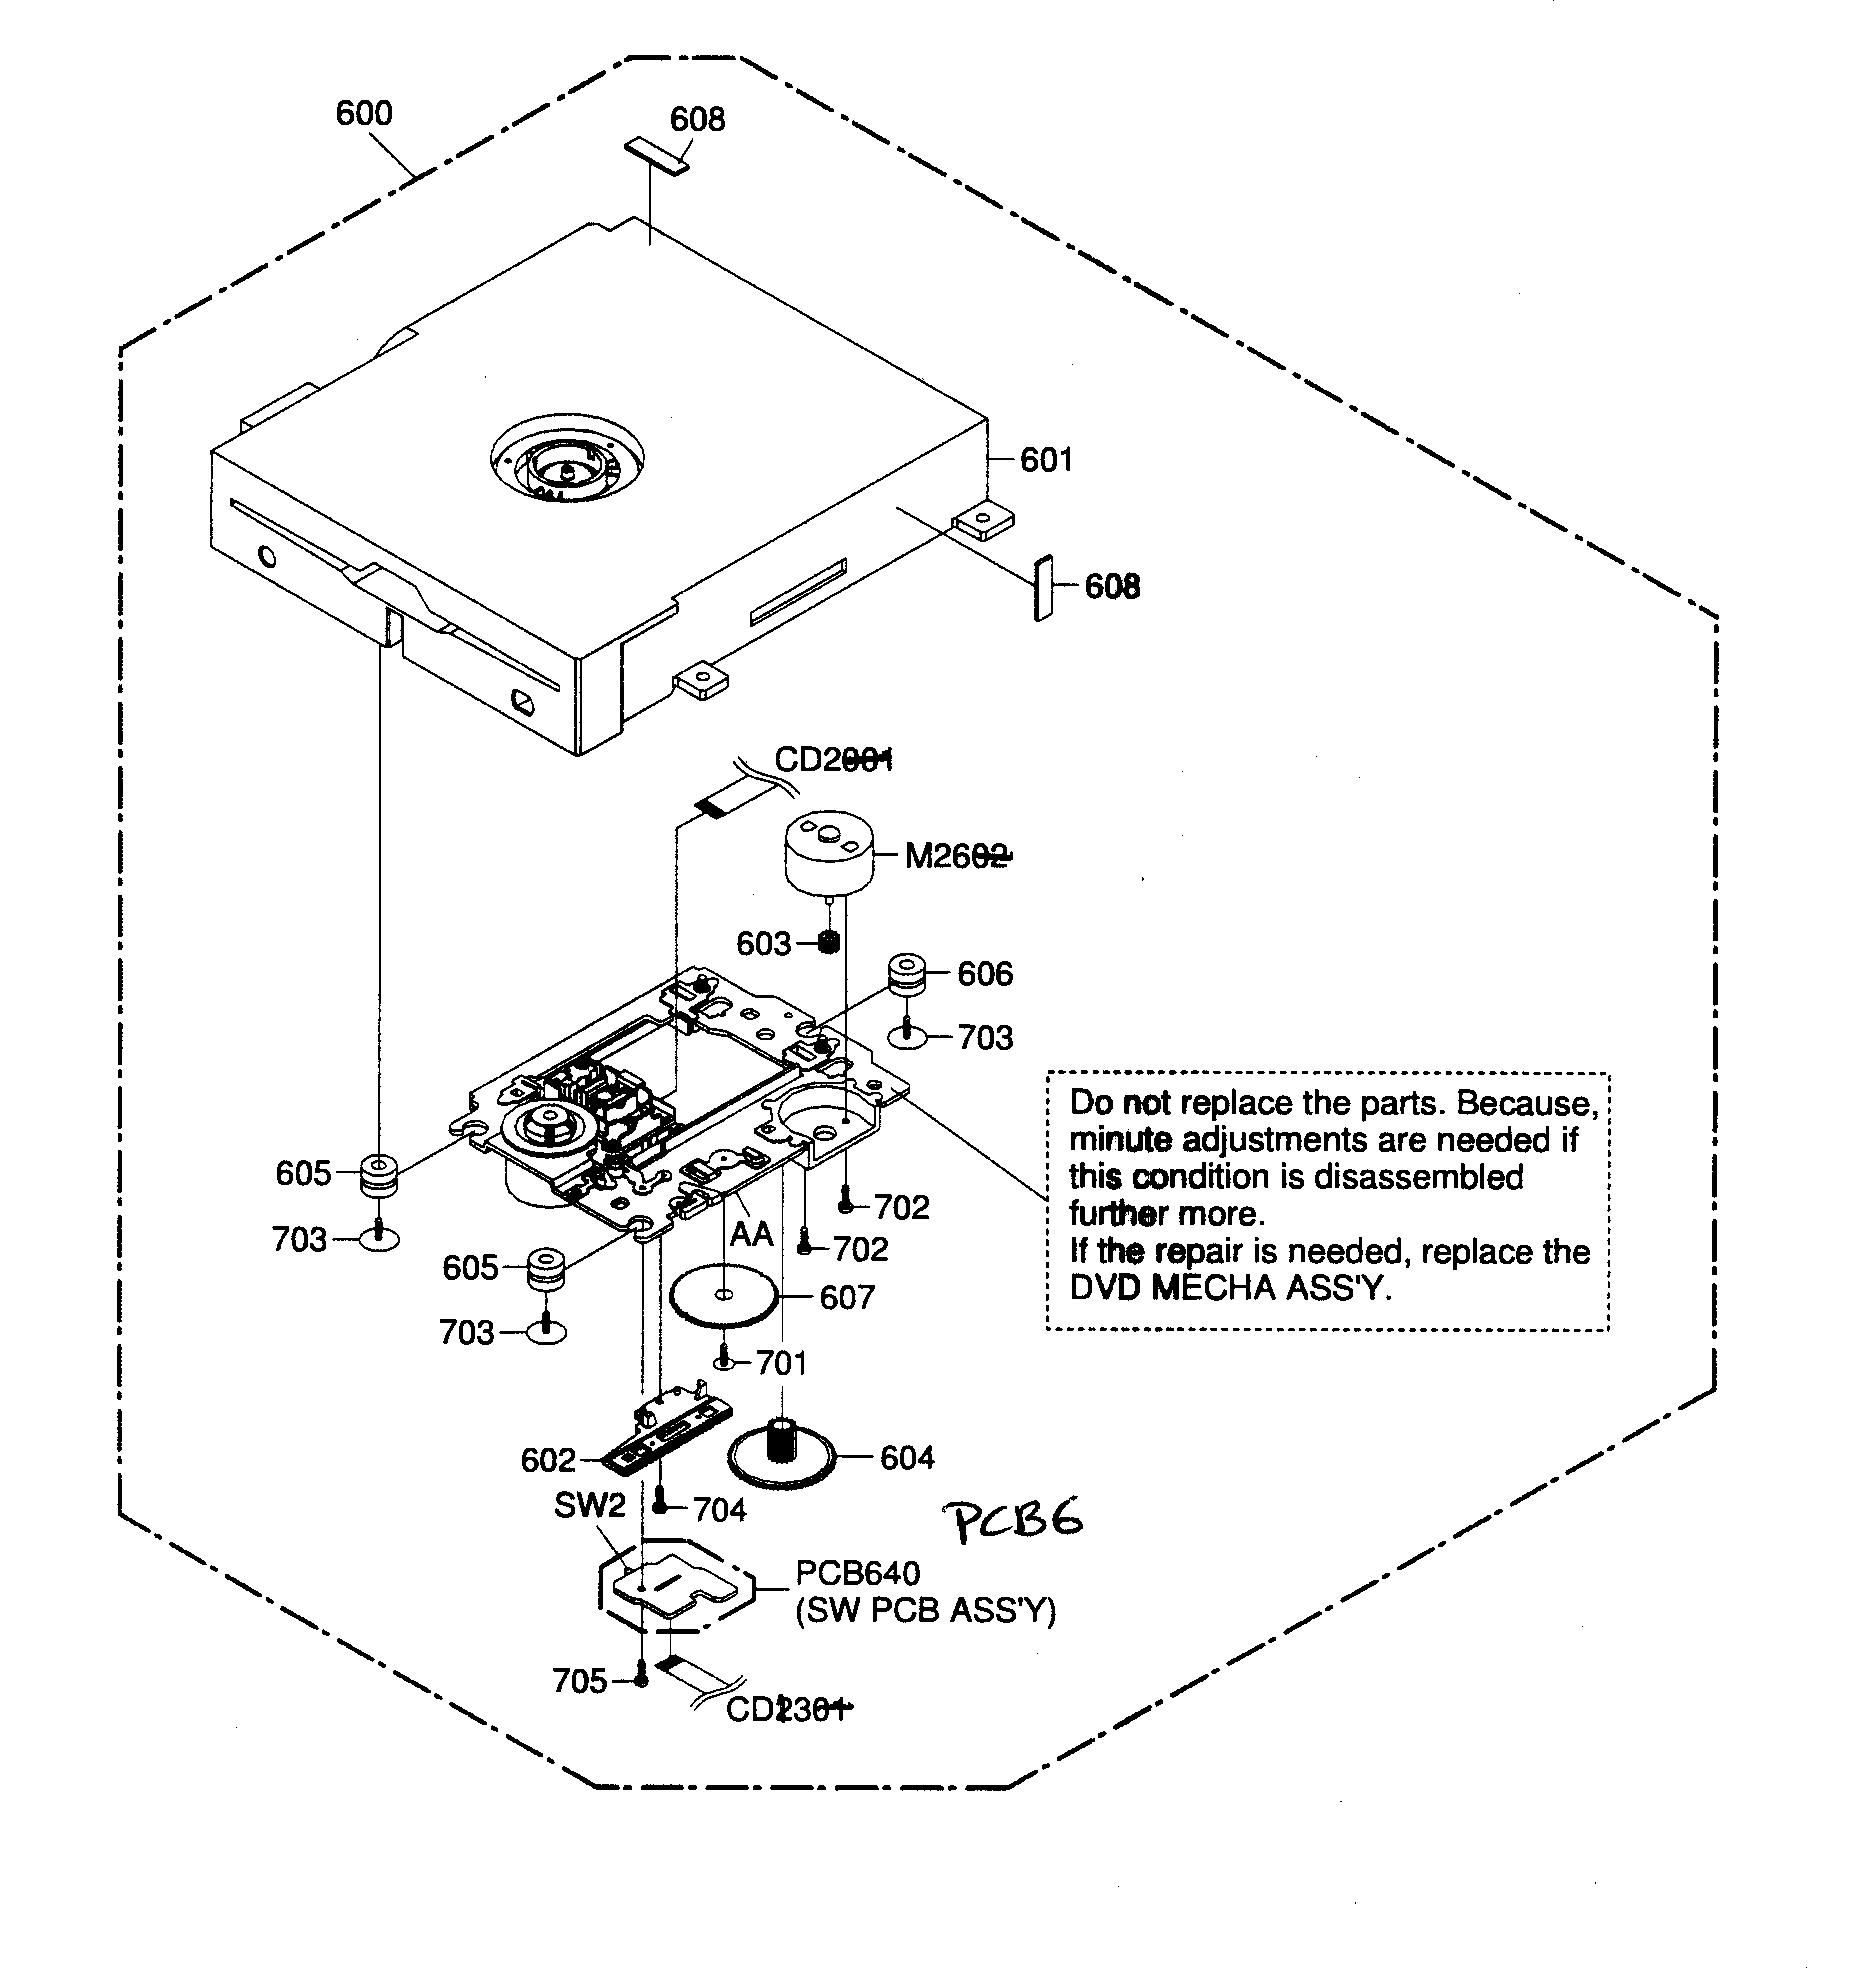 Toshiba model 26LV61K tv/vcr or dvd combo genuine parts